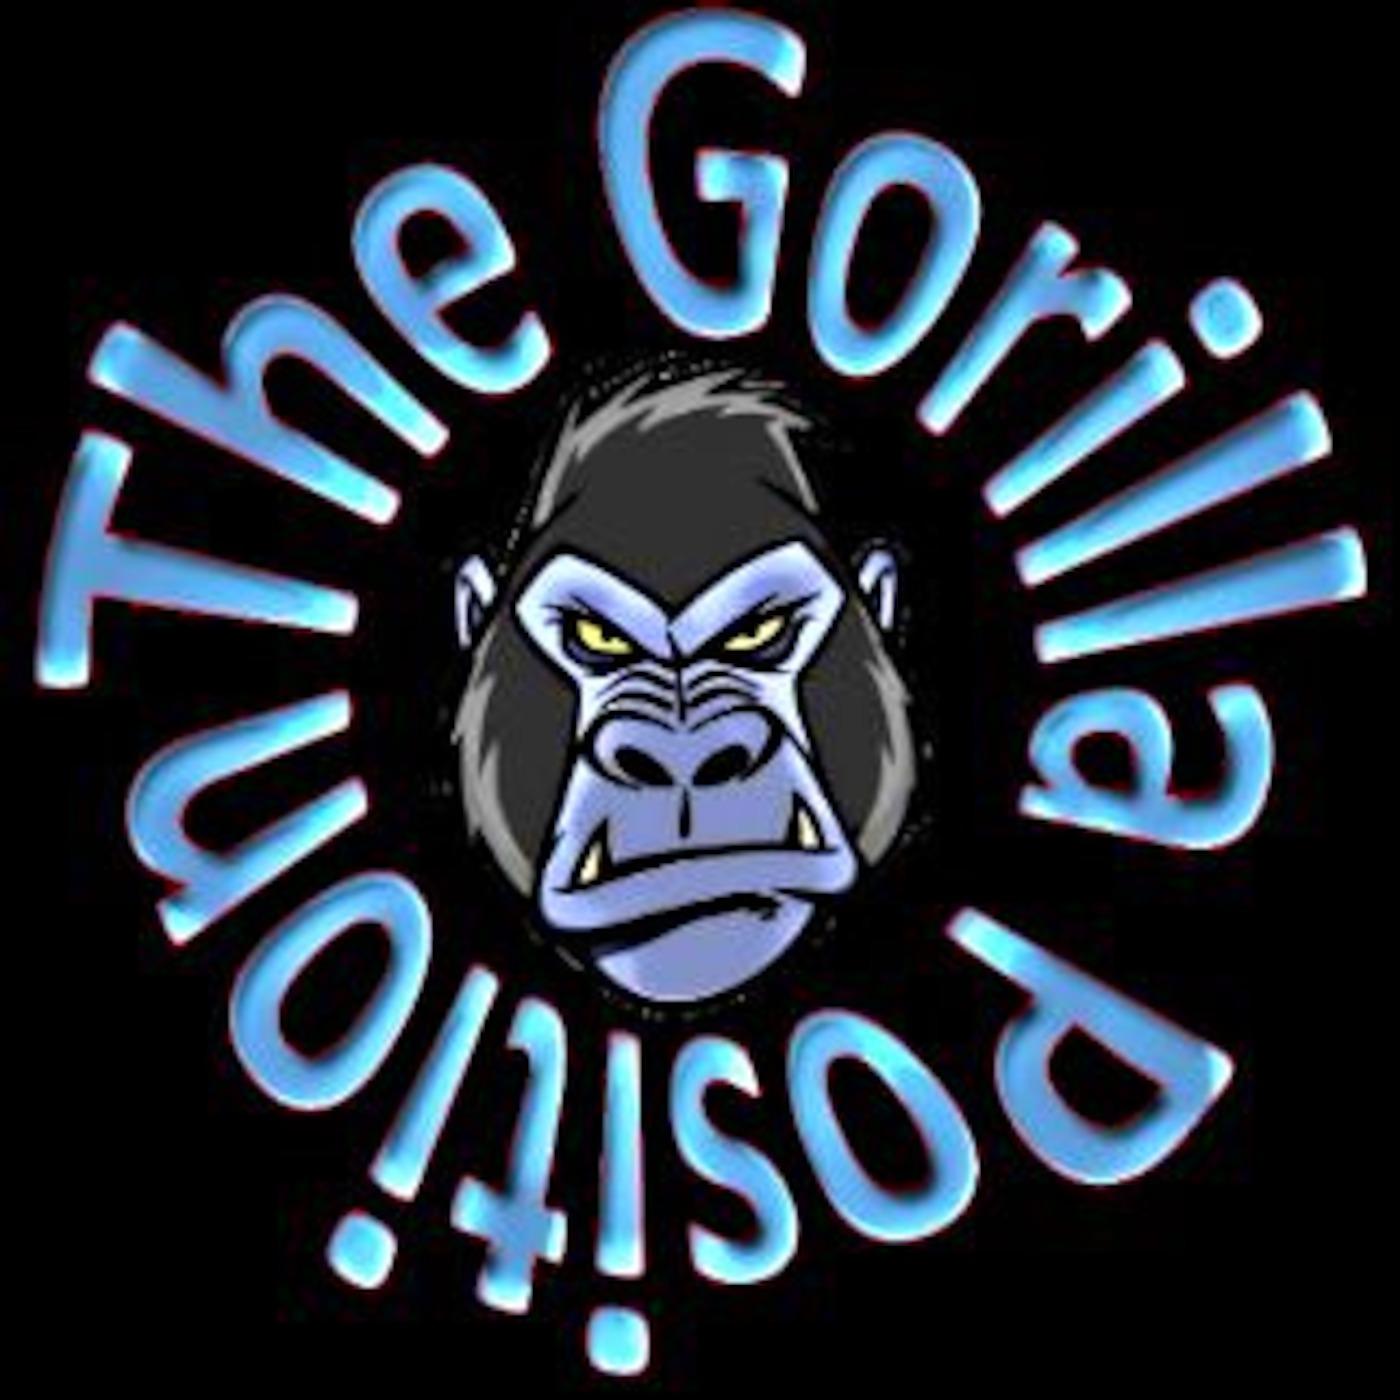 The Gorilla Position